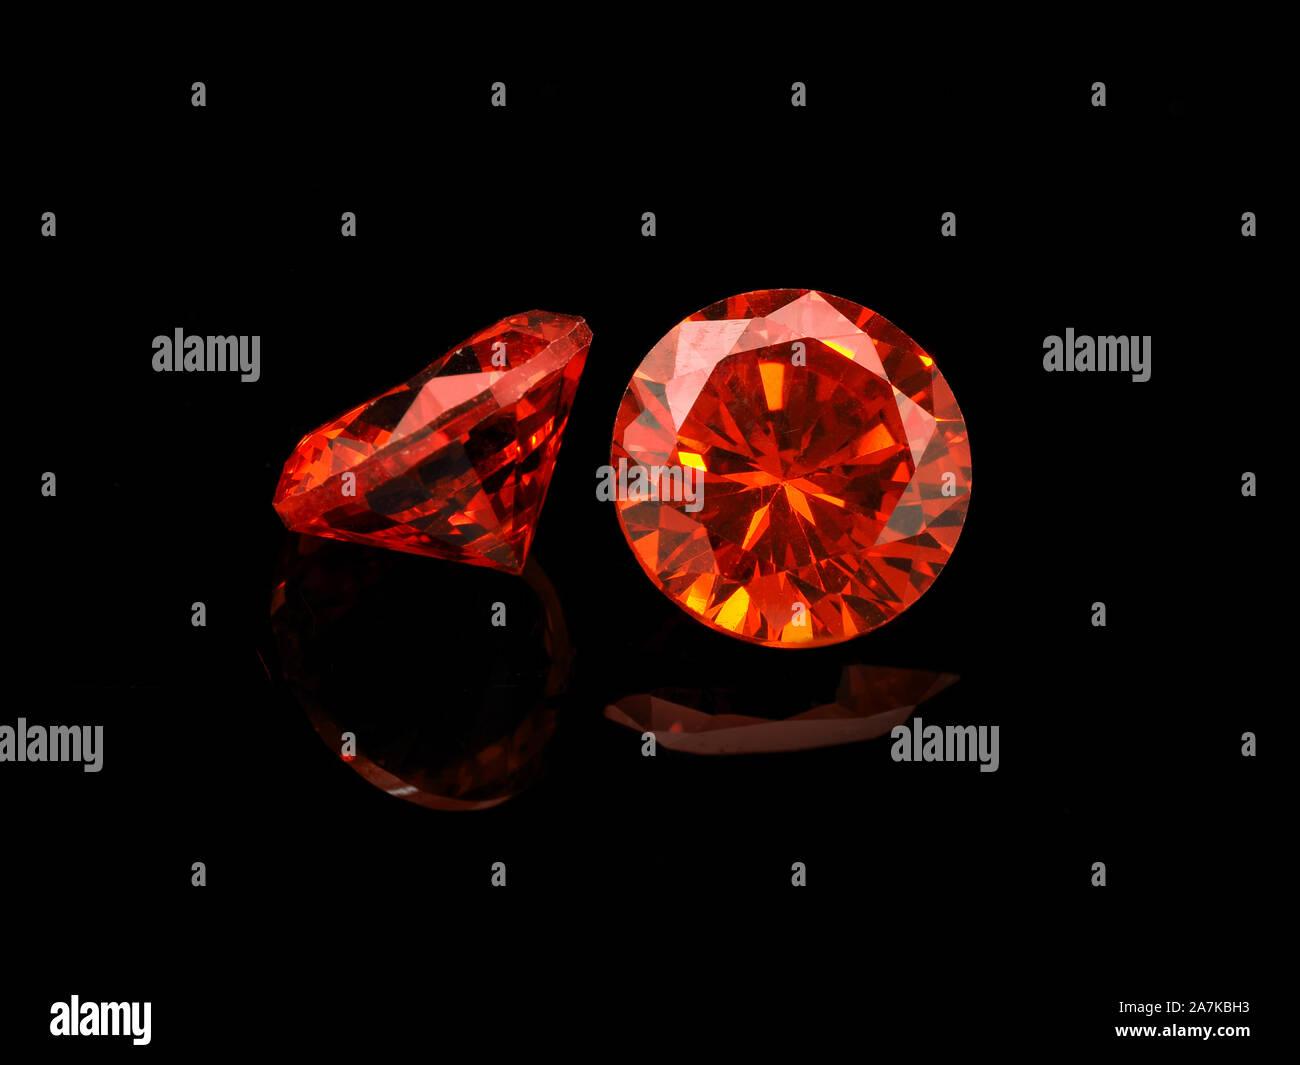 Light Red Semi-Precious Gemstone on a Black Background. Stock Photo